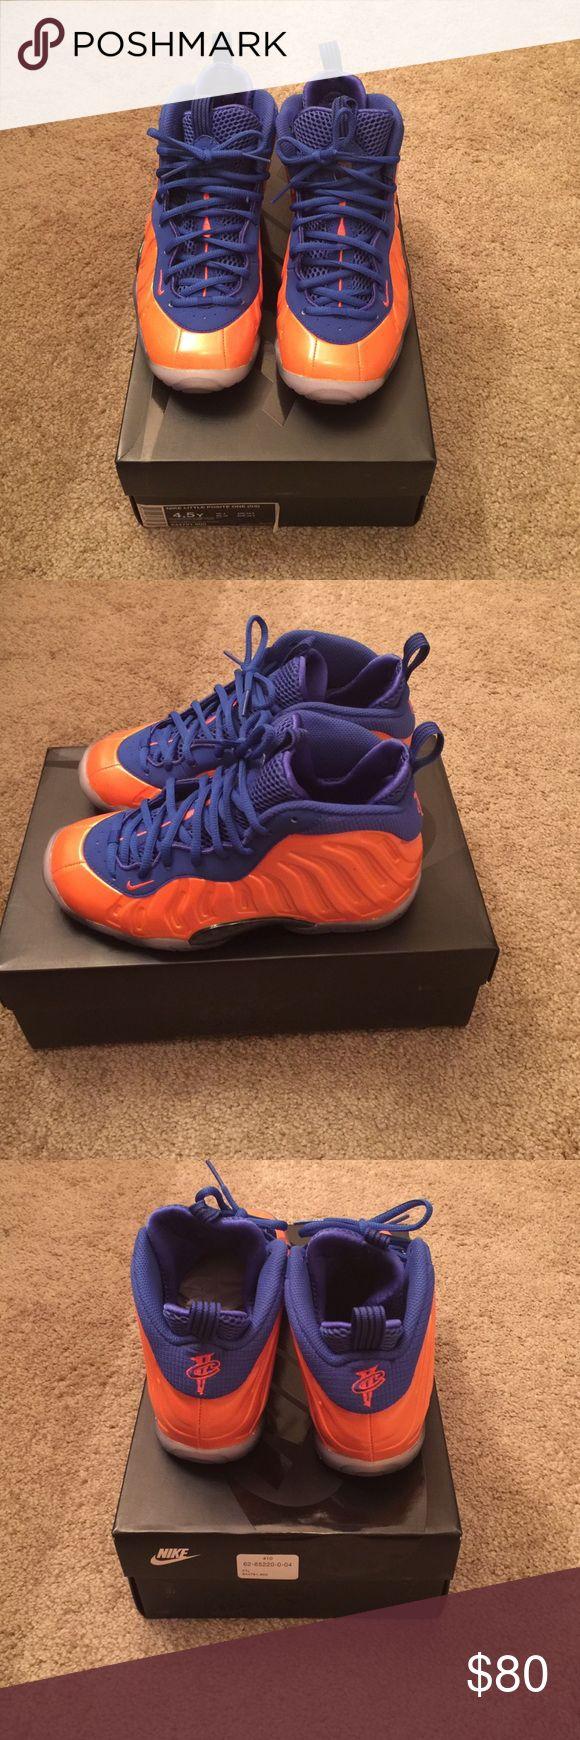 Nike Sneakers (Kids) Knicks foamposites Nike Shoes Athletic Shoes